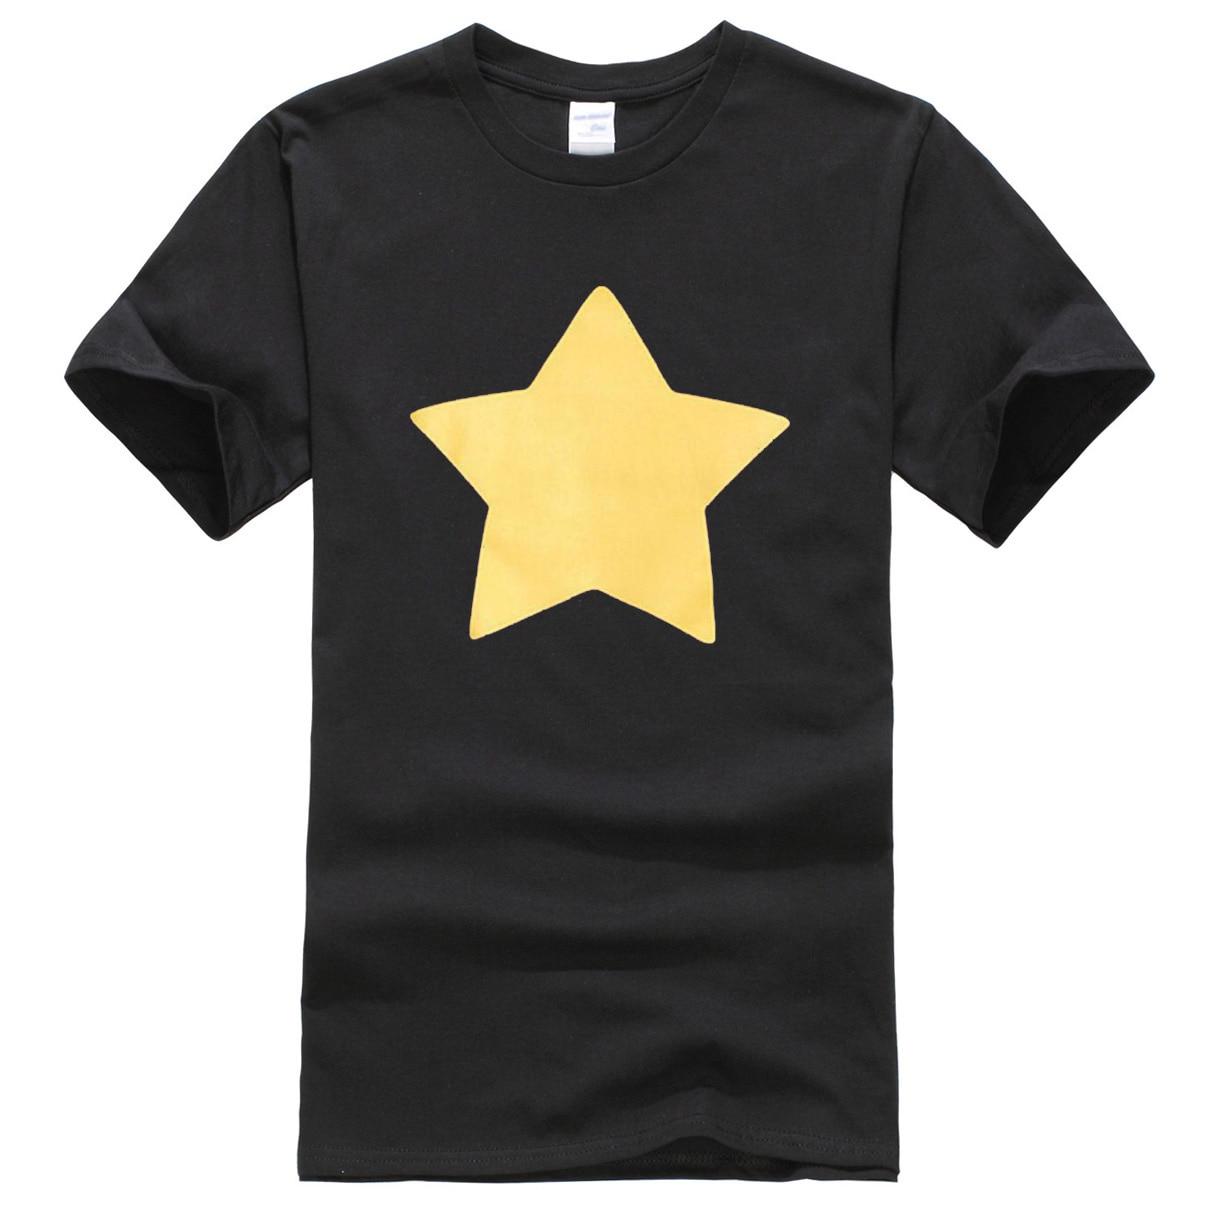 2019 Summer Short Sleeve T-shirt Printed STEVEN UNIVERSE STAR Pattern Fashion Cool Hip Hop Streetwear Men's T-shirts Harajuku